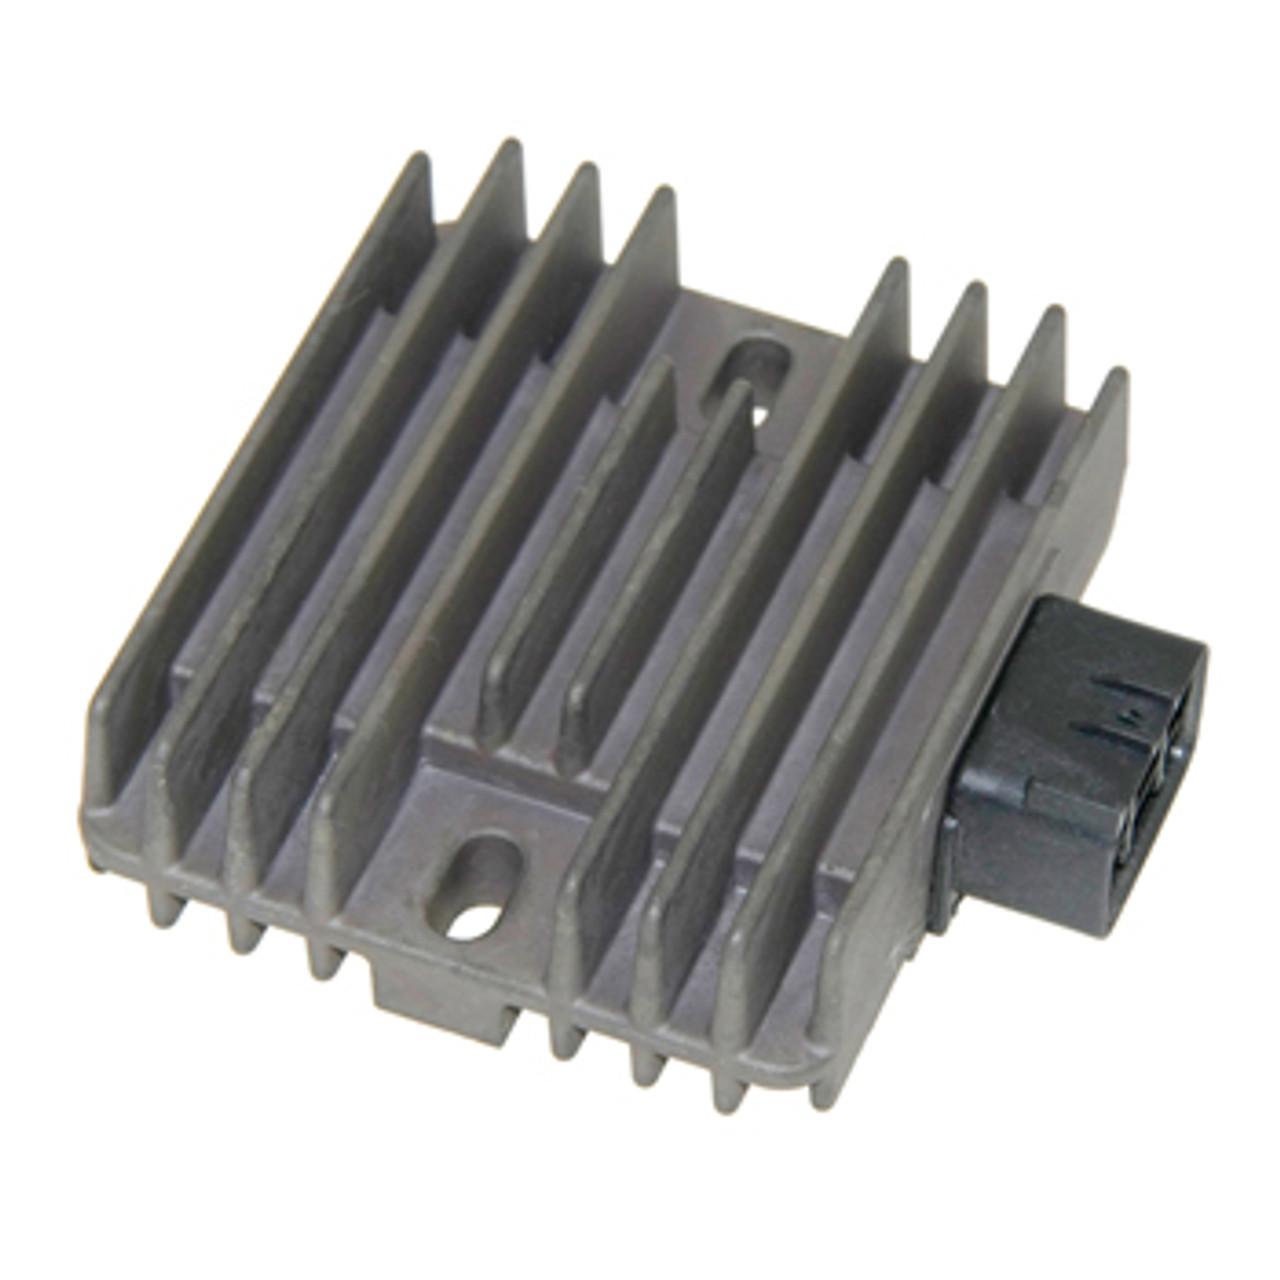 Mercury 75/115 HP 4-Stroke & Yamaha 50/115 HP 4-Stroke Voltage Regulator Replaces OEM # 68V-81960, 6D3-81960